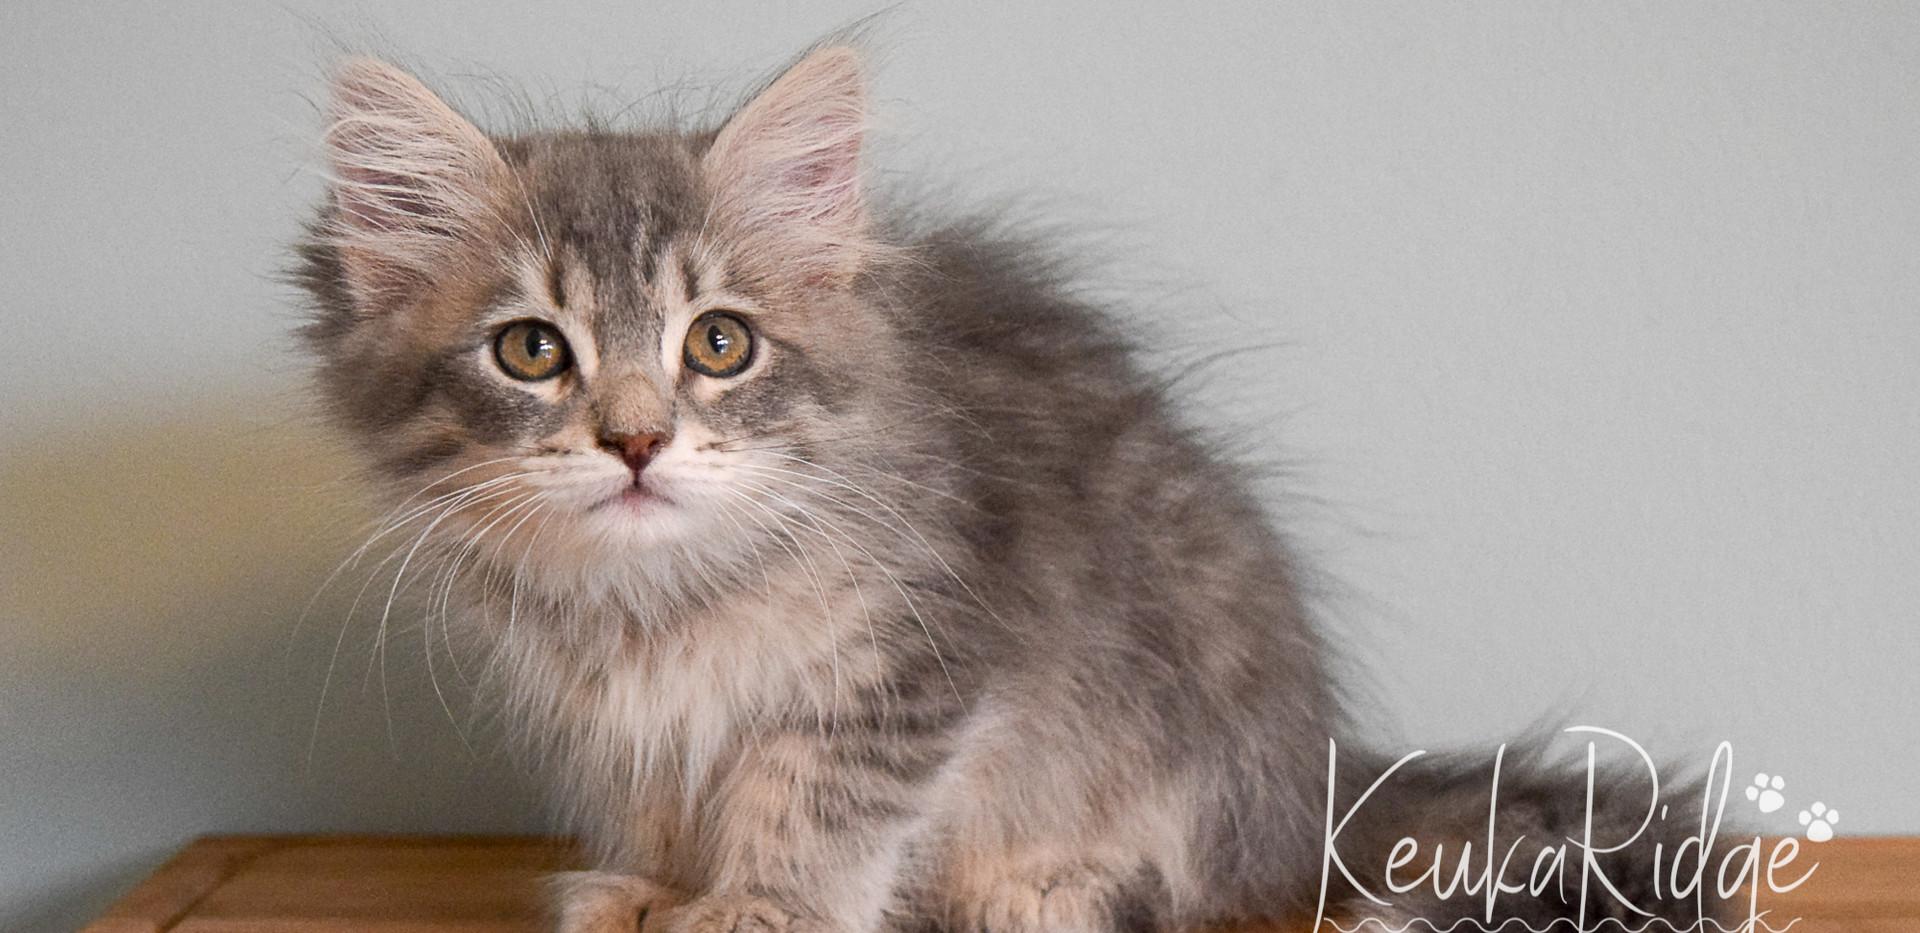 Keuka Ridge Finley - 11.5 Weeks Old